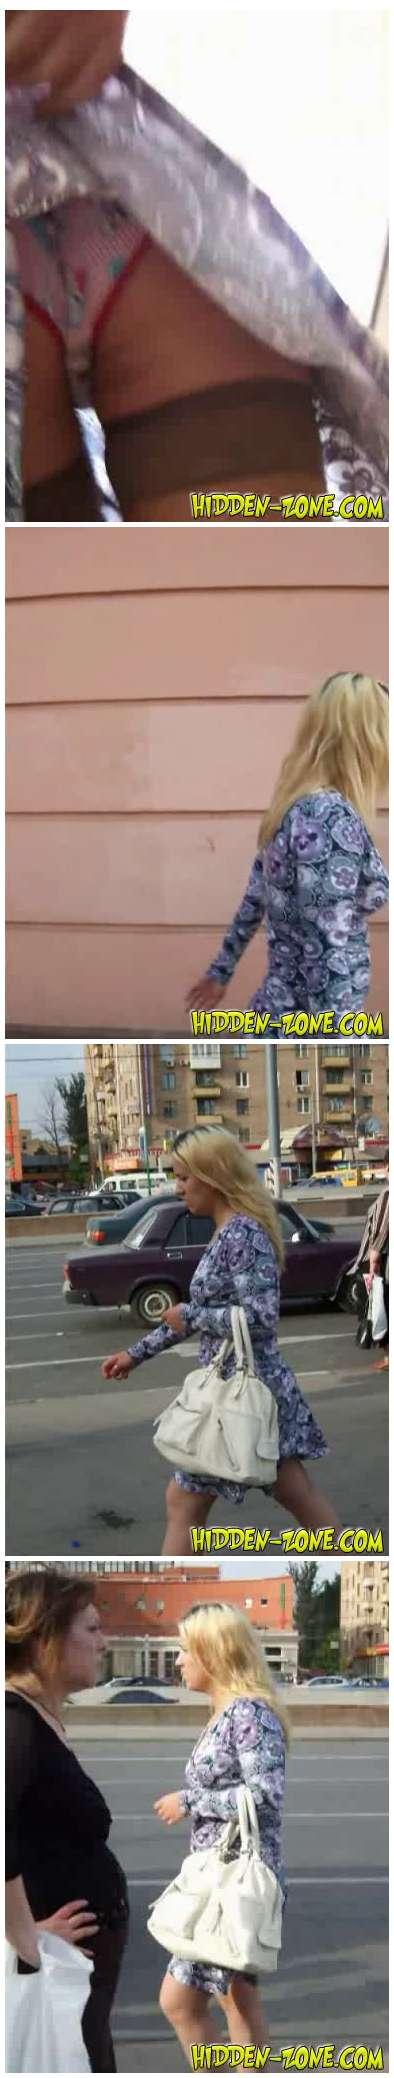 [Image: Hidden-Zone_Upskirt760_cover.jpg]